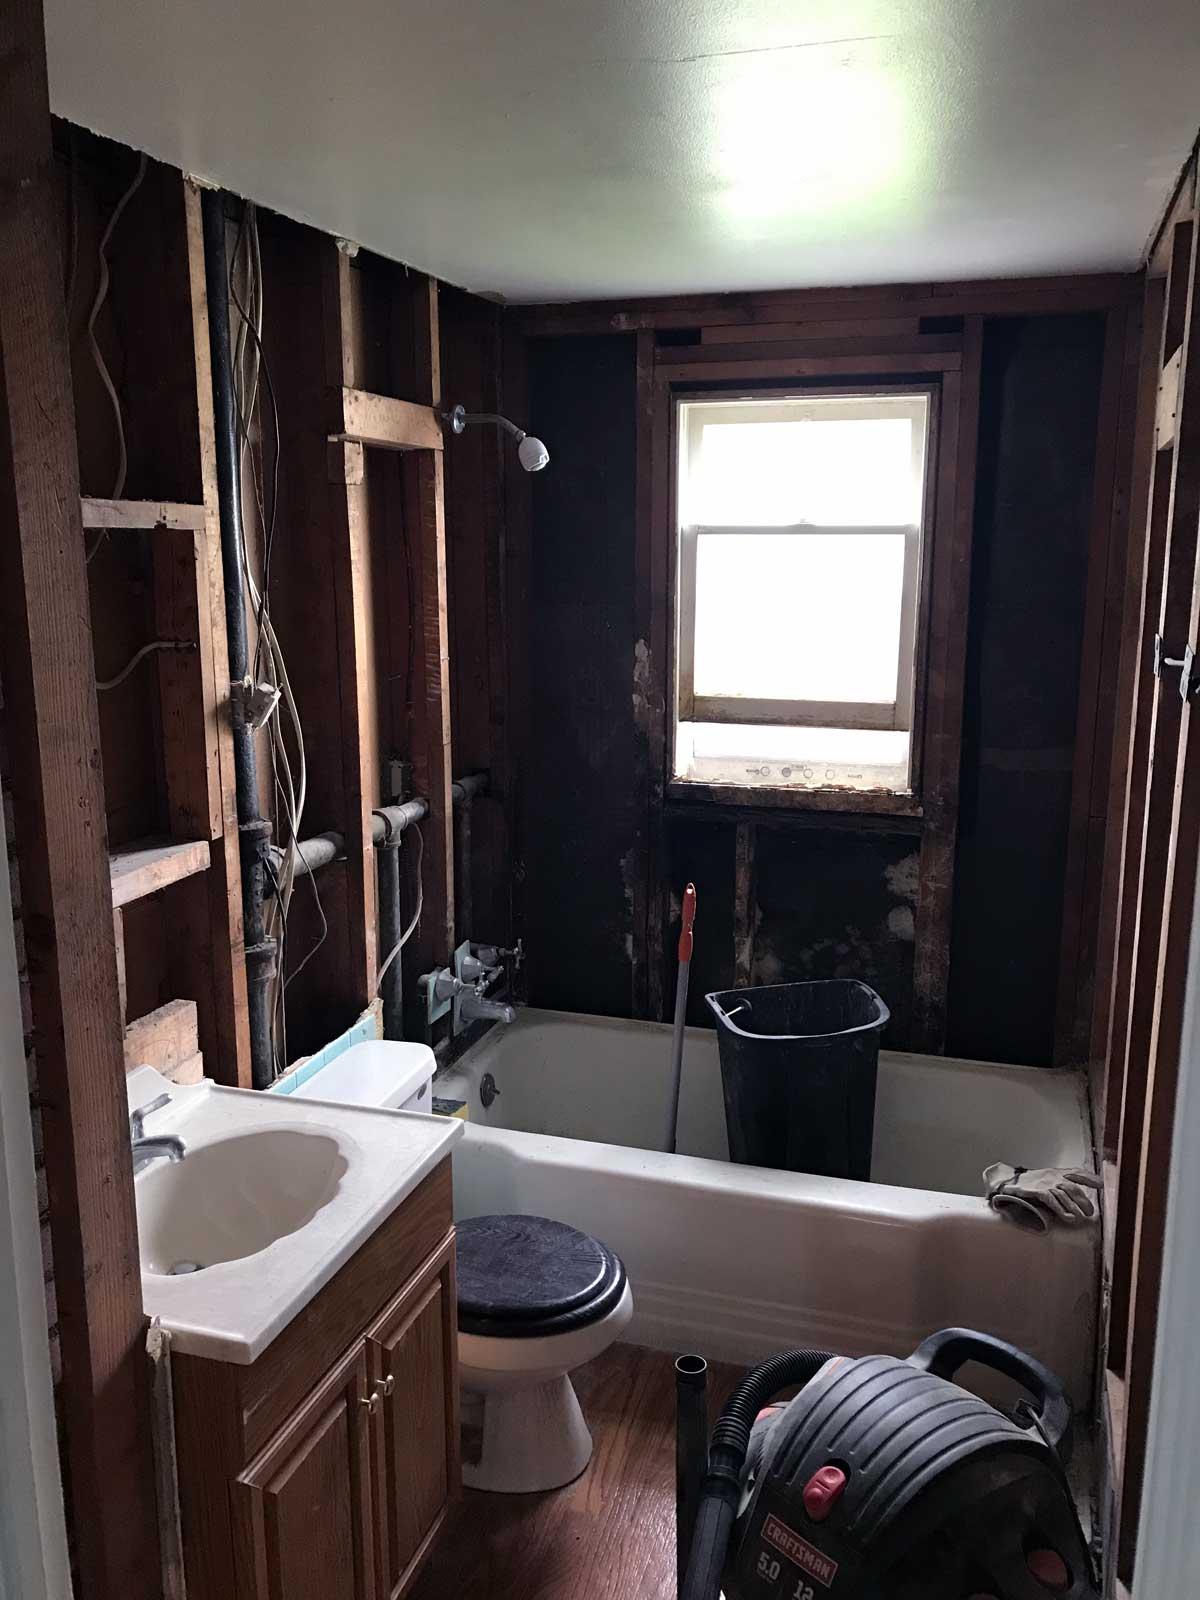 15 Day Bathroom Renovation Demolition 03